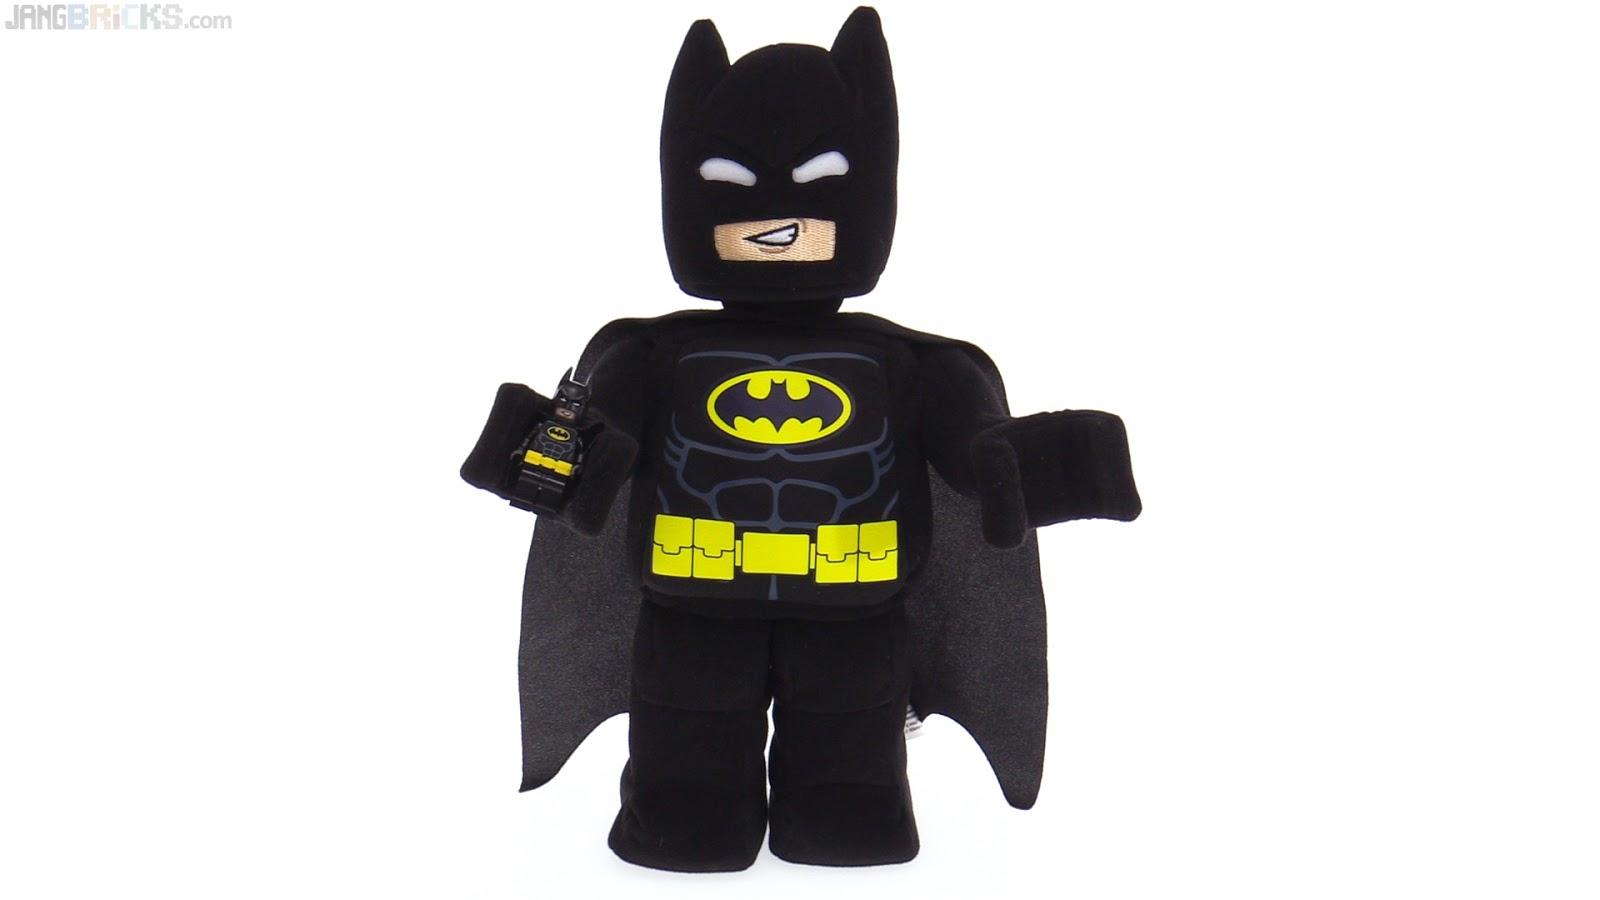 Lego Batman Toys : Lego batman minifigure plush toy review